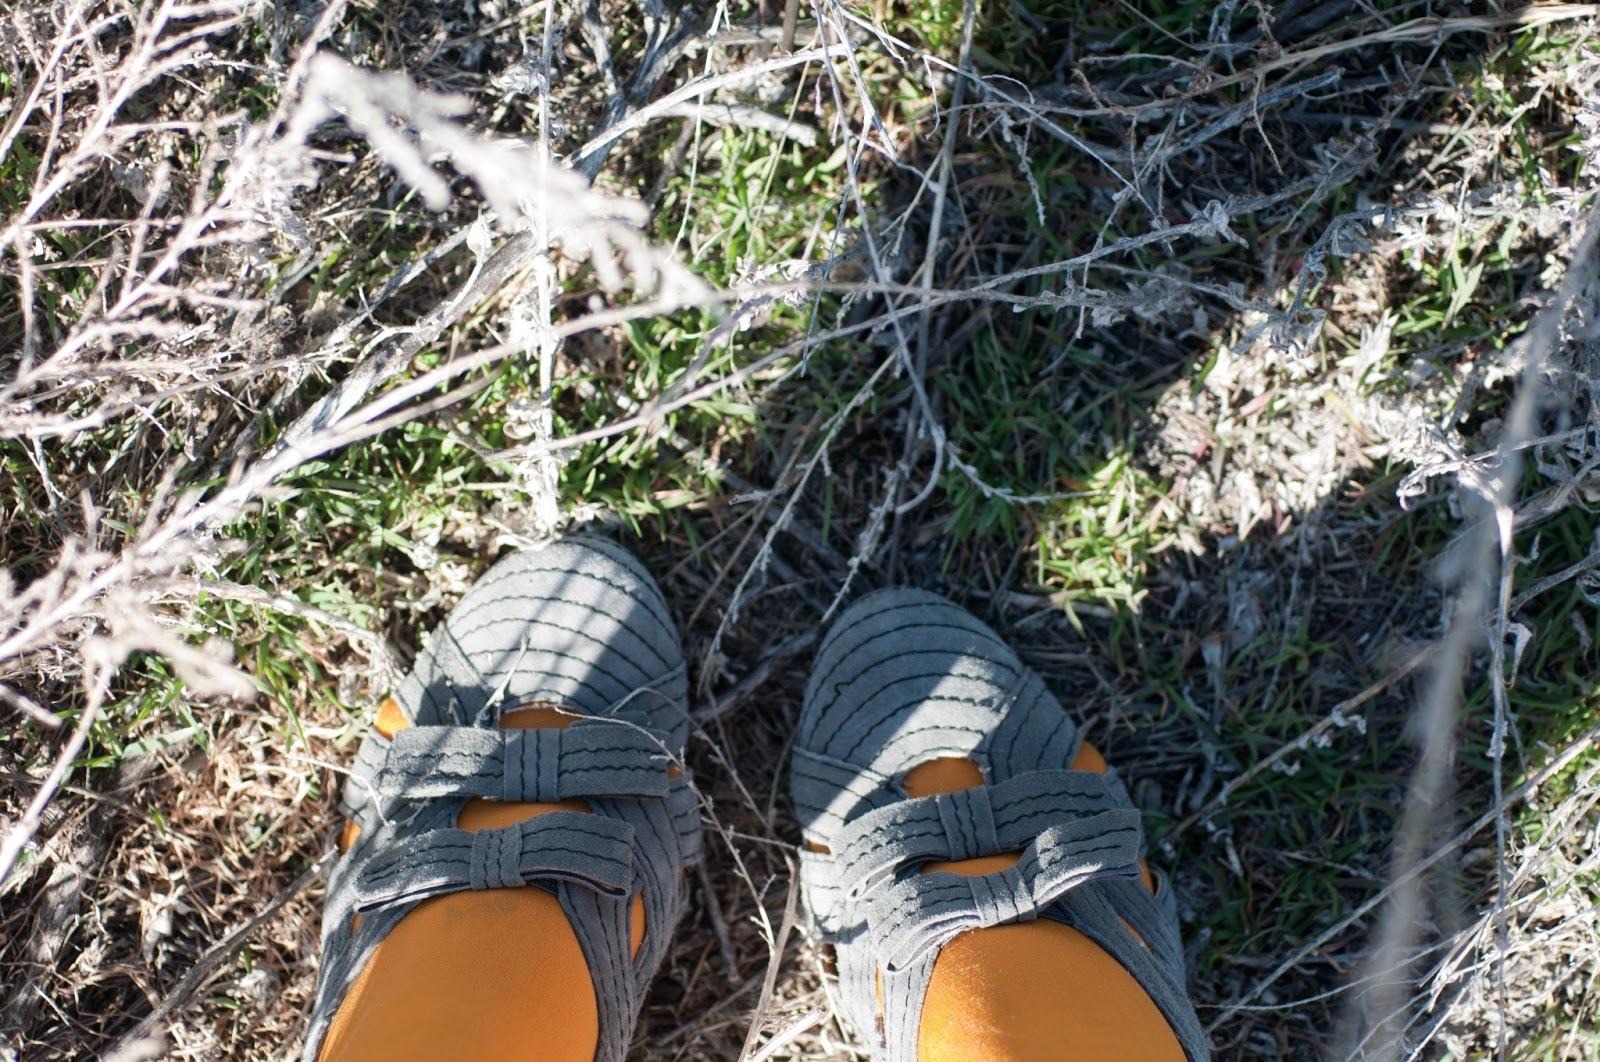 seychelles, mustard, mustard tights, bow shoes, bows, urban, heels, shoes, style, fashion, blogger, fashion blogger, gray, black thread,